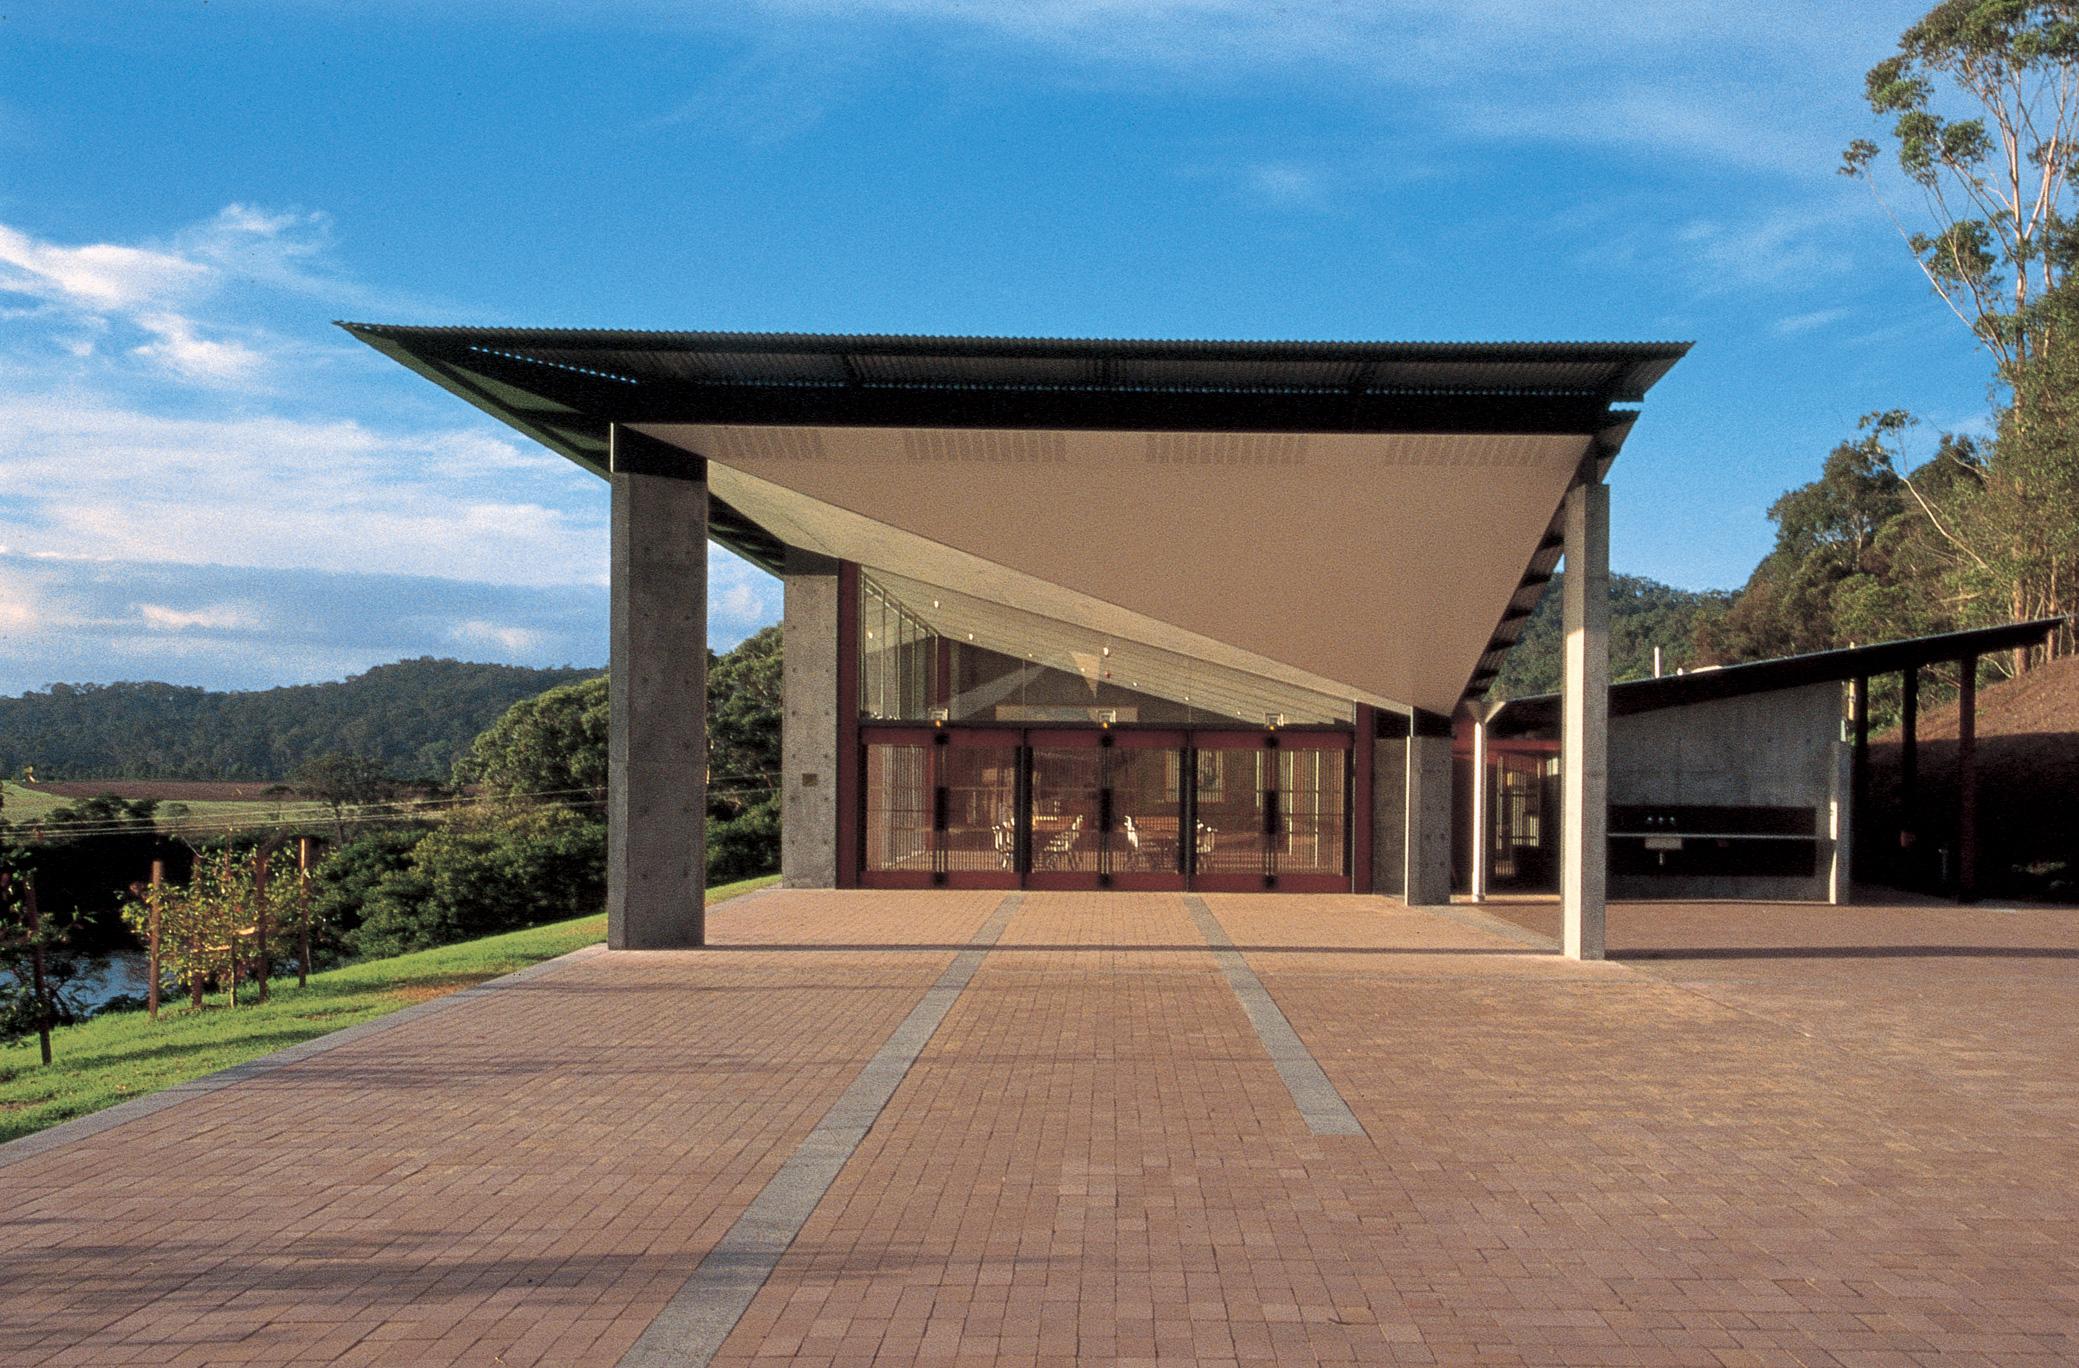 la profession l 39 international ordre des architectes. Black Bedroom Furniture Sets. Home Design Ideas